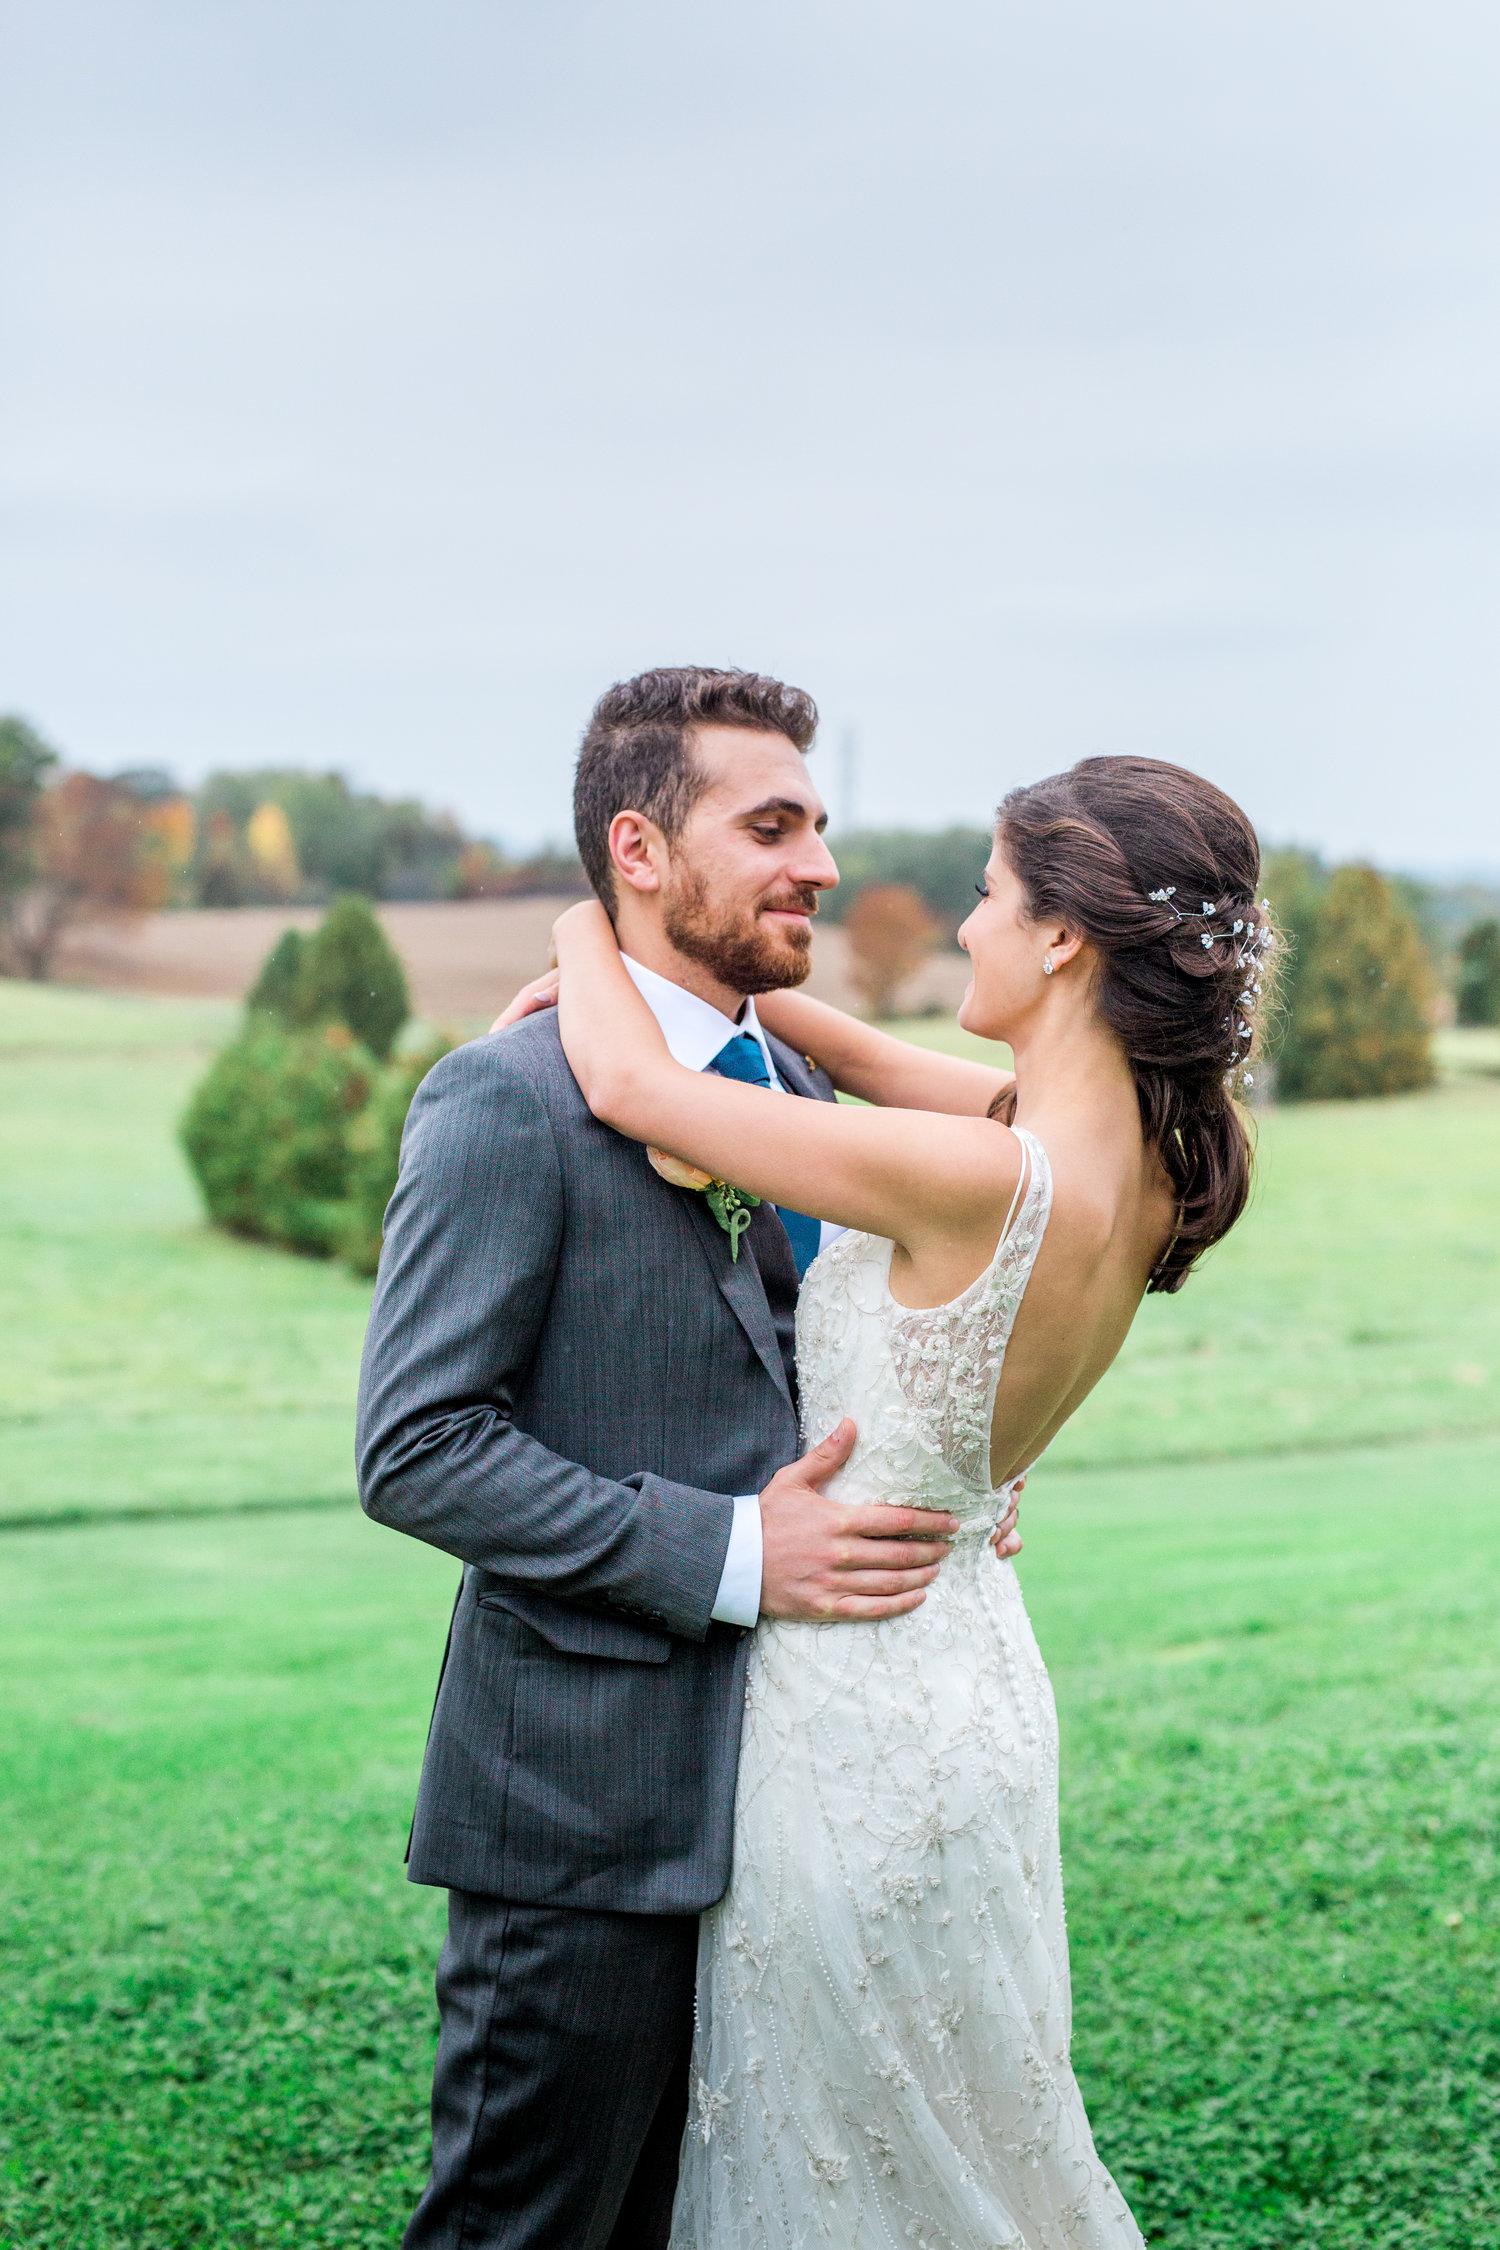 Amir-Golbazi-Danielle-Giroux-Photography_Toronto-Wedding_Cedarwood_Rachel-Paul_454.jpg